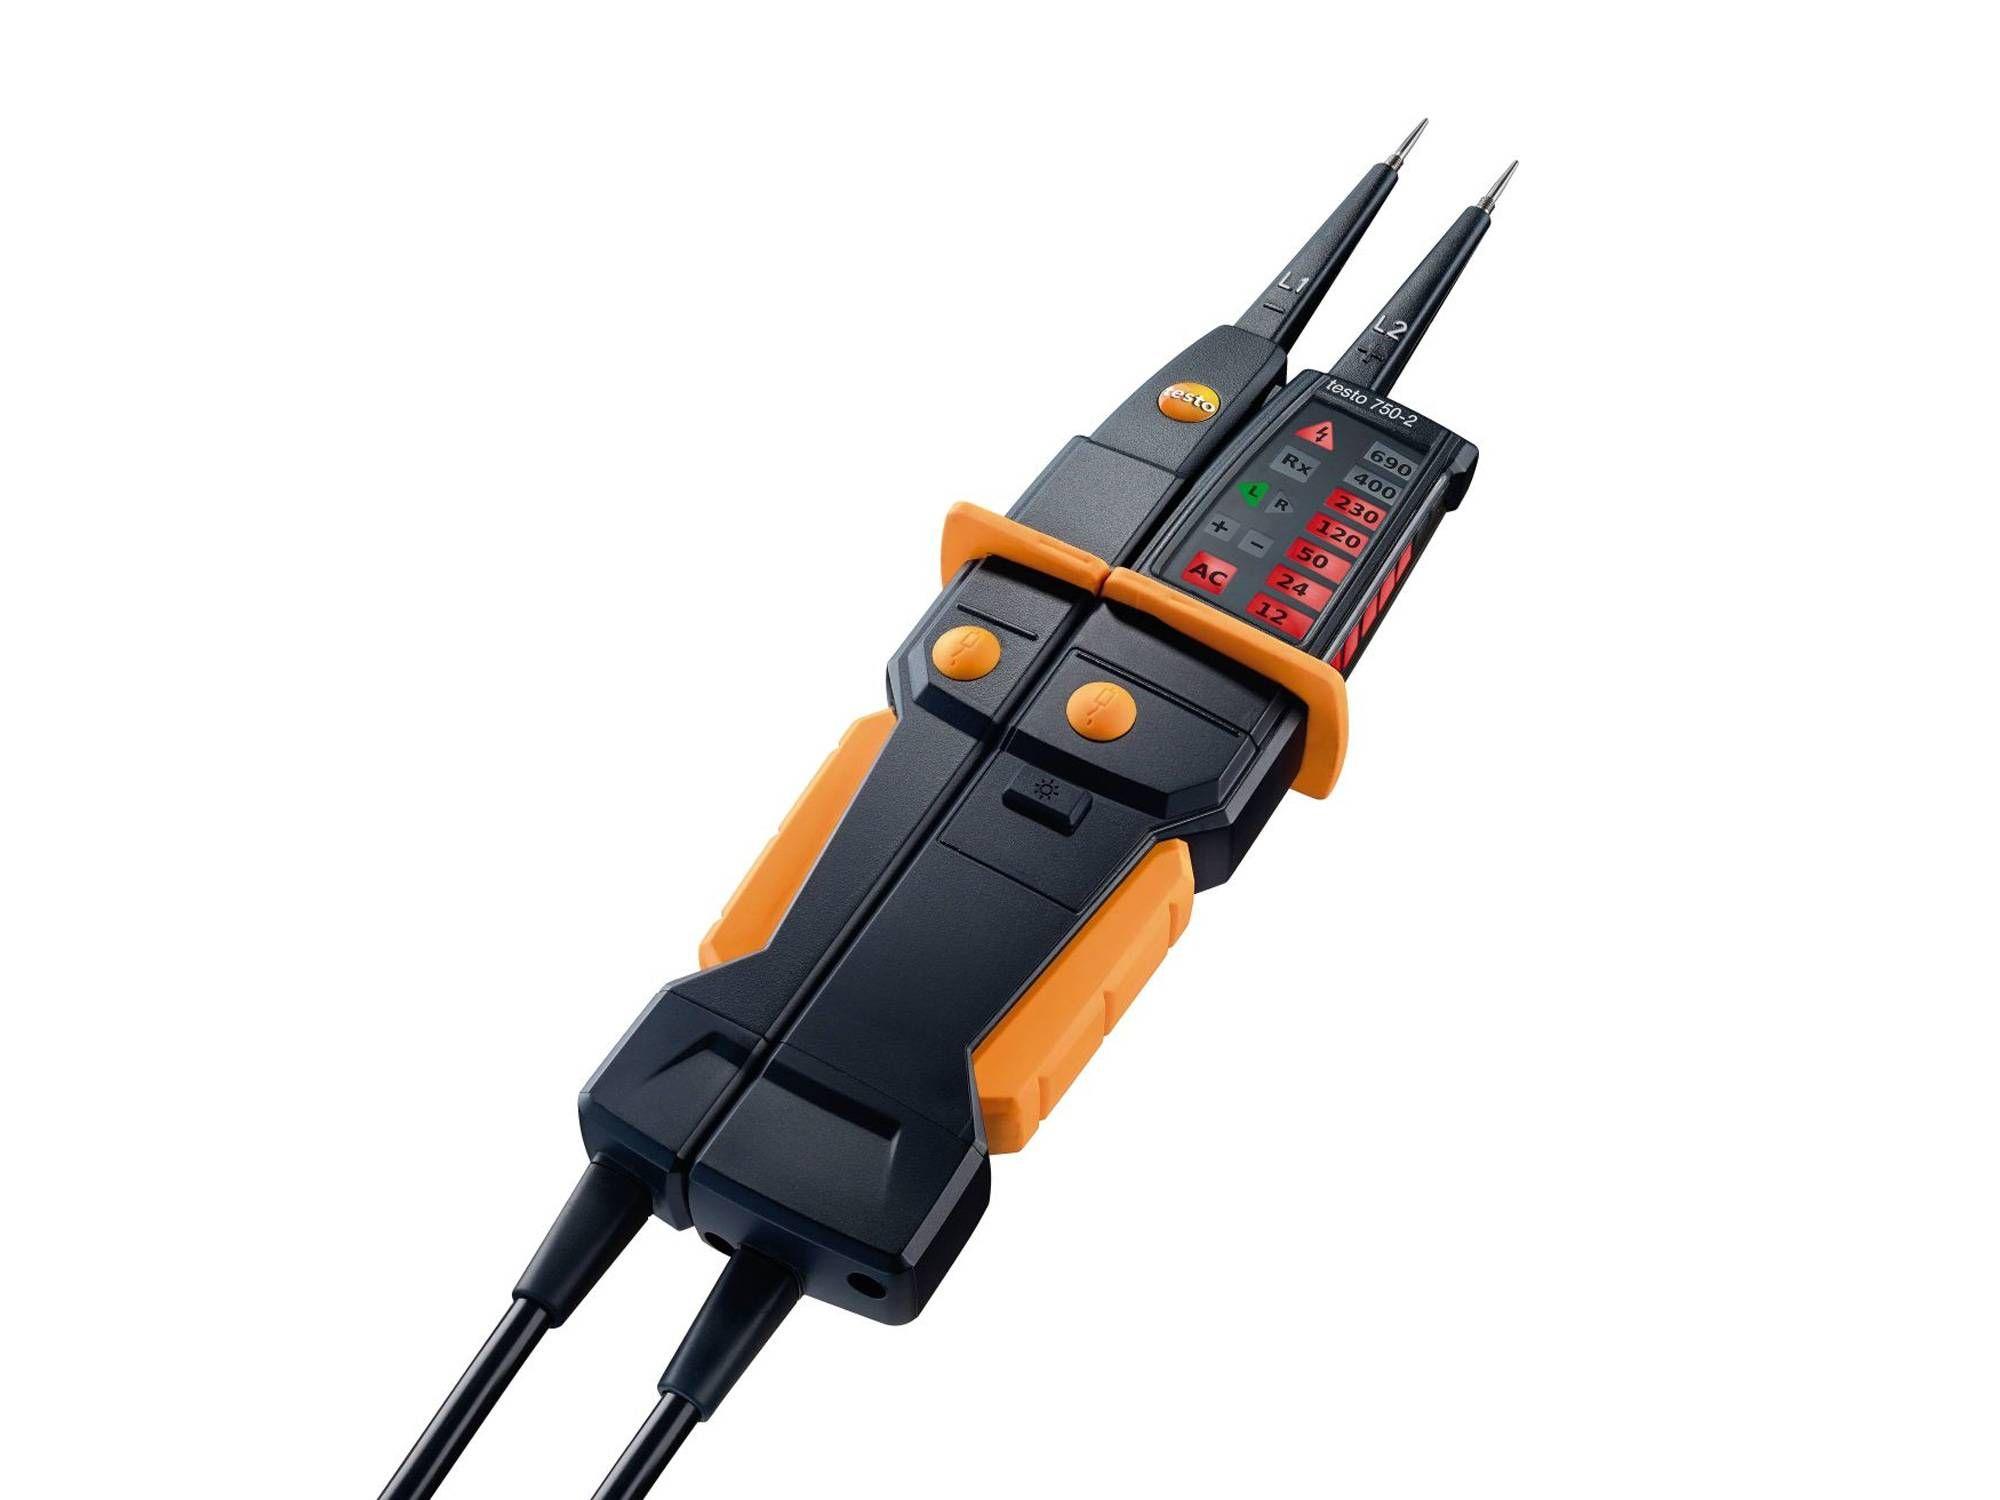 Voltage tester testo 750-2